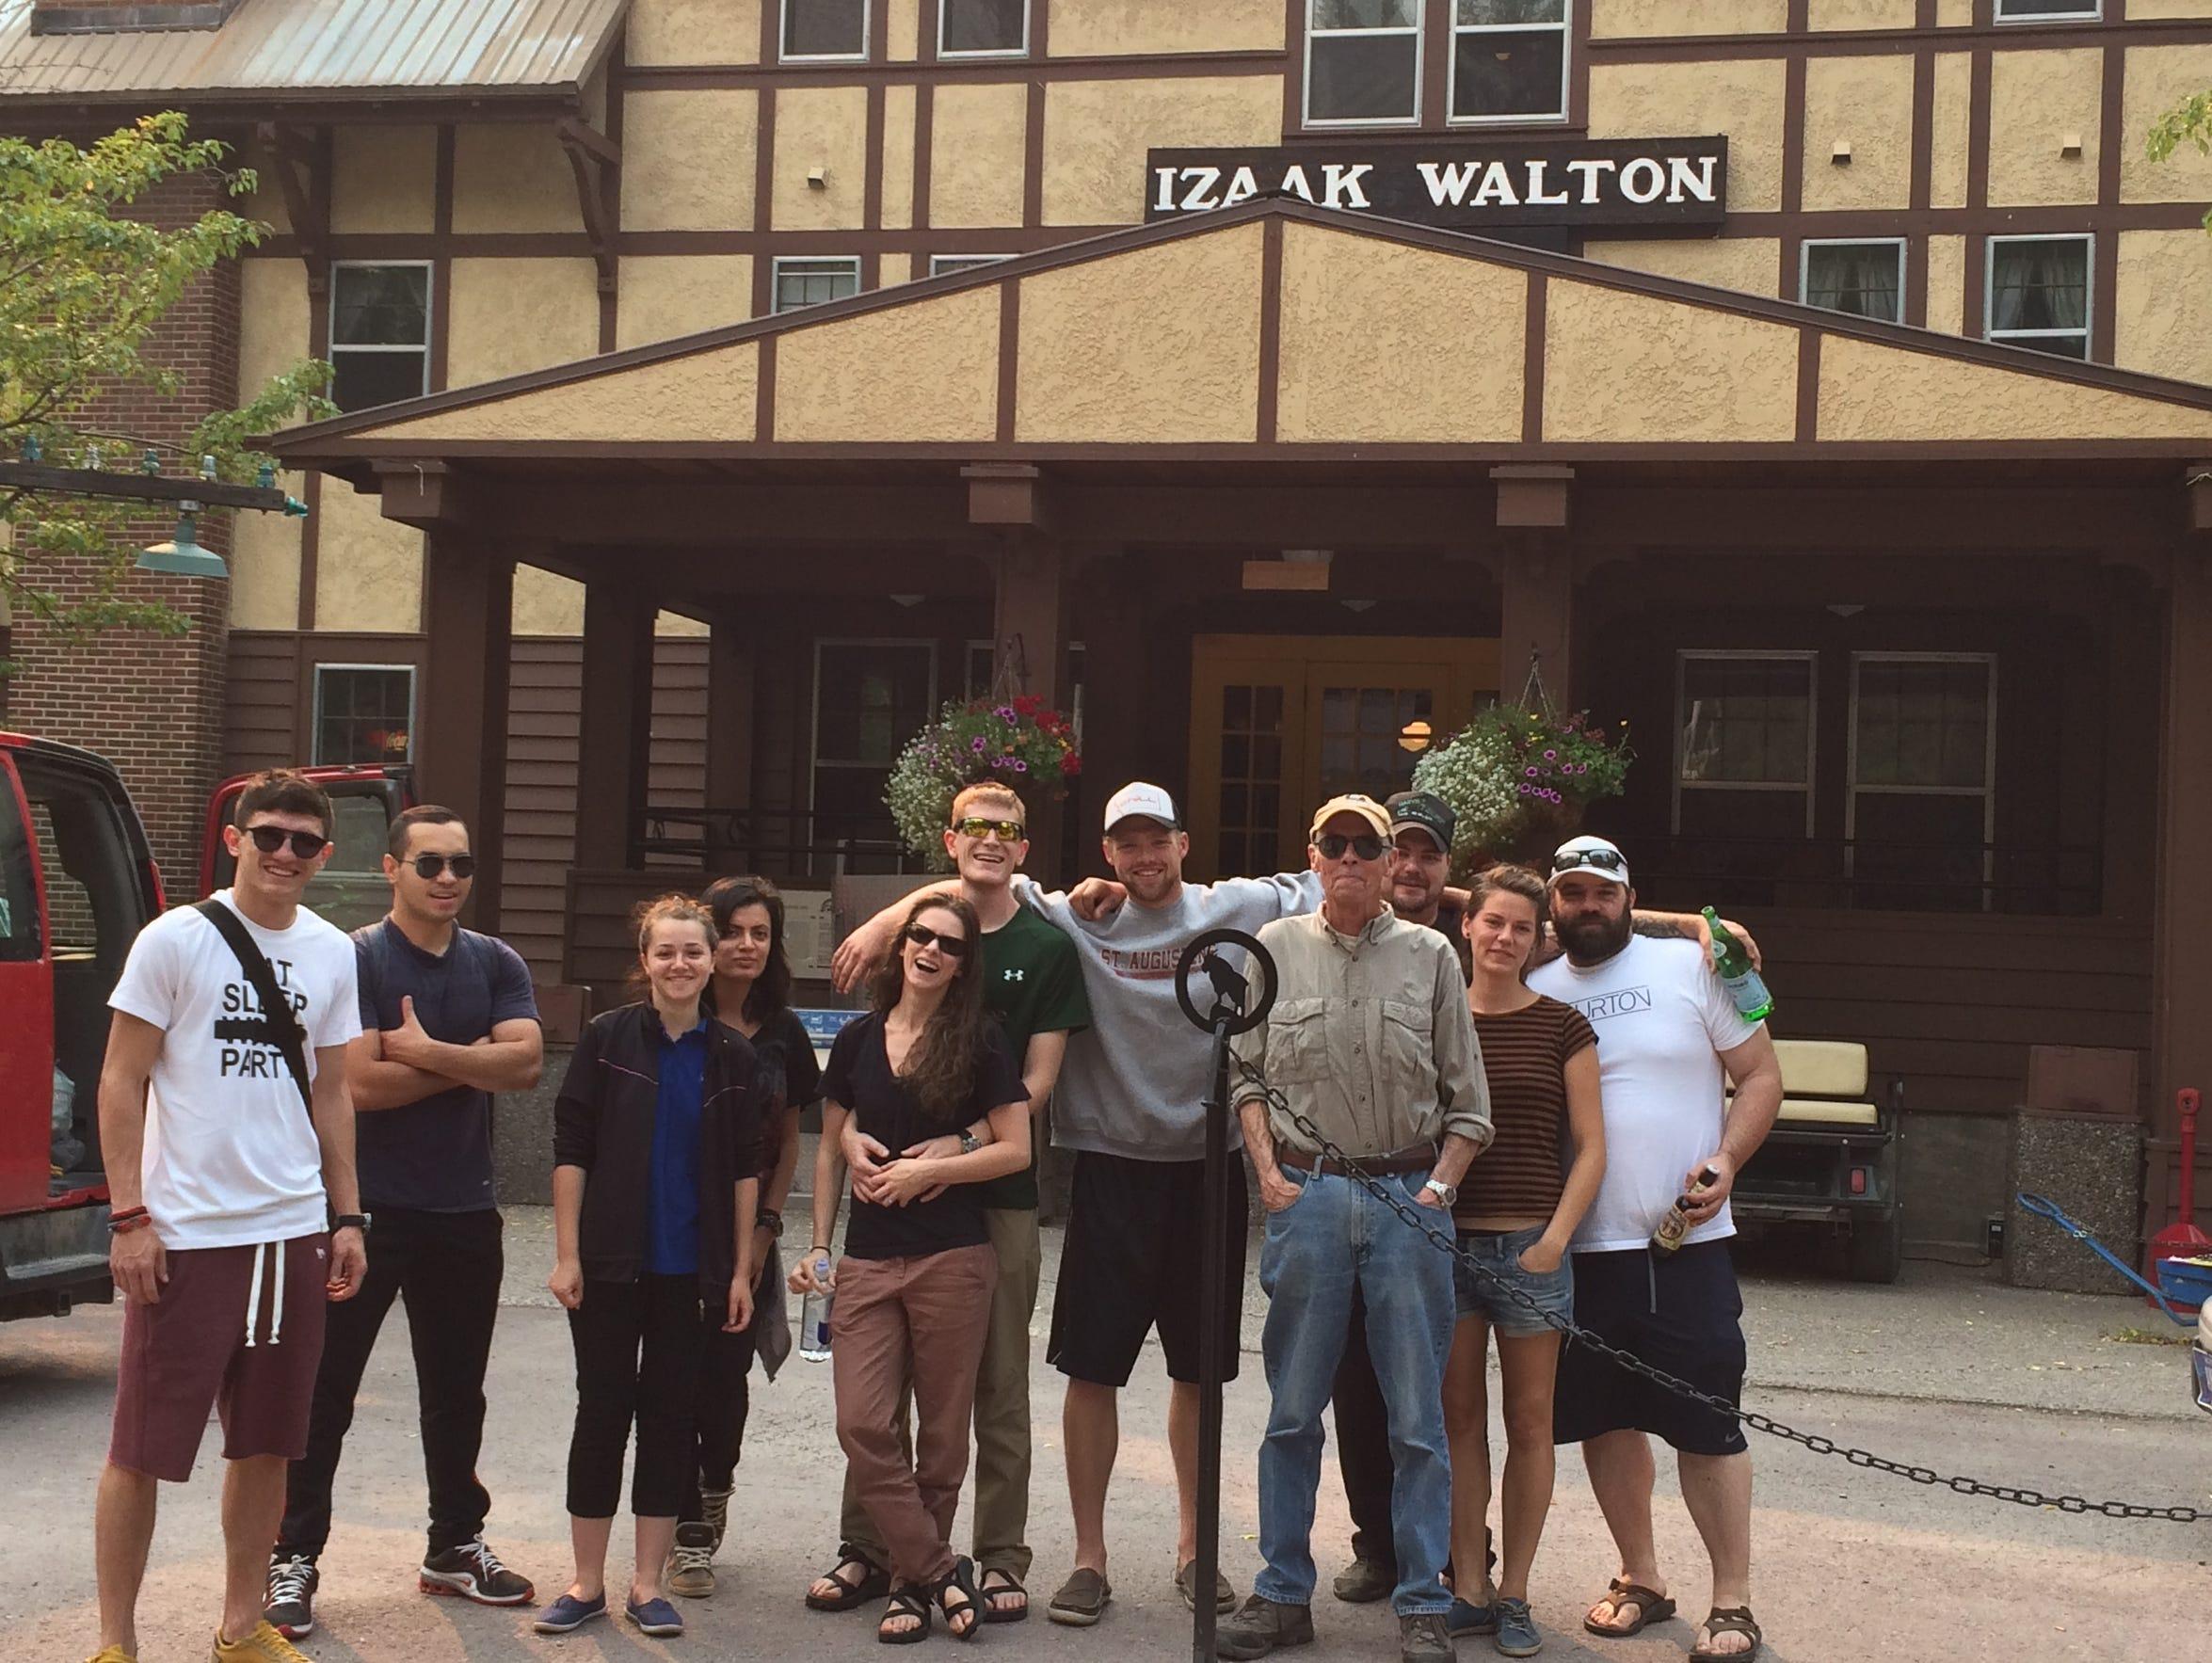 Izaak Walton Inn staff poses for a photo before leaving